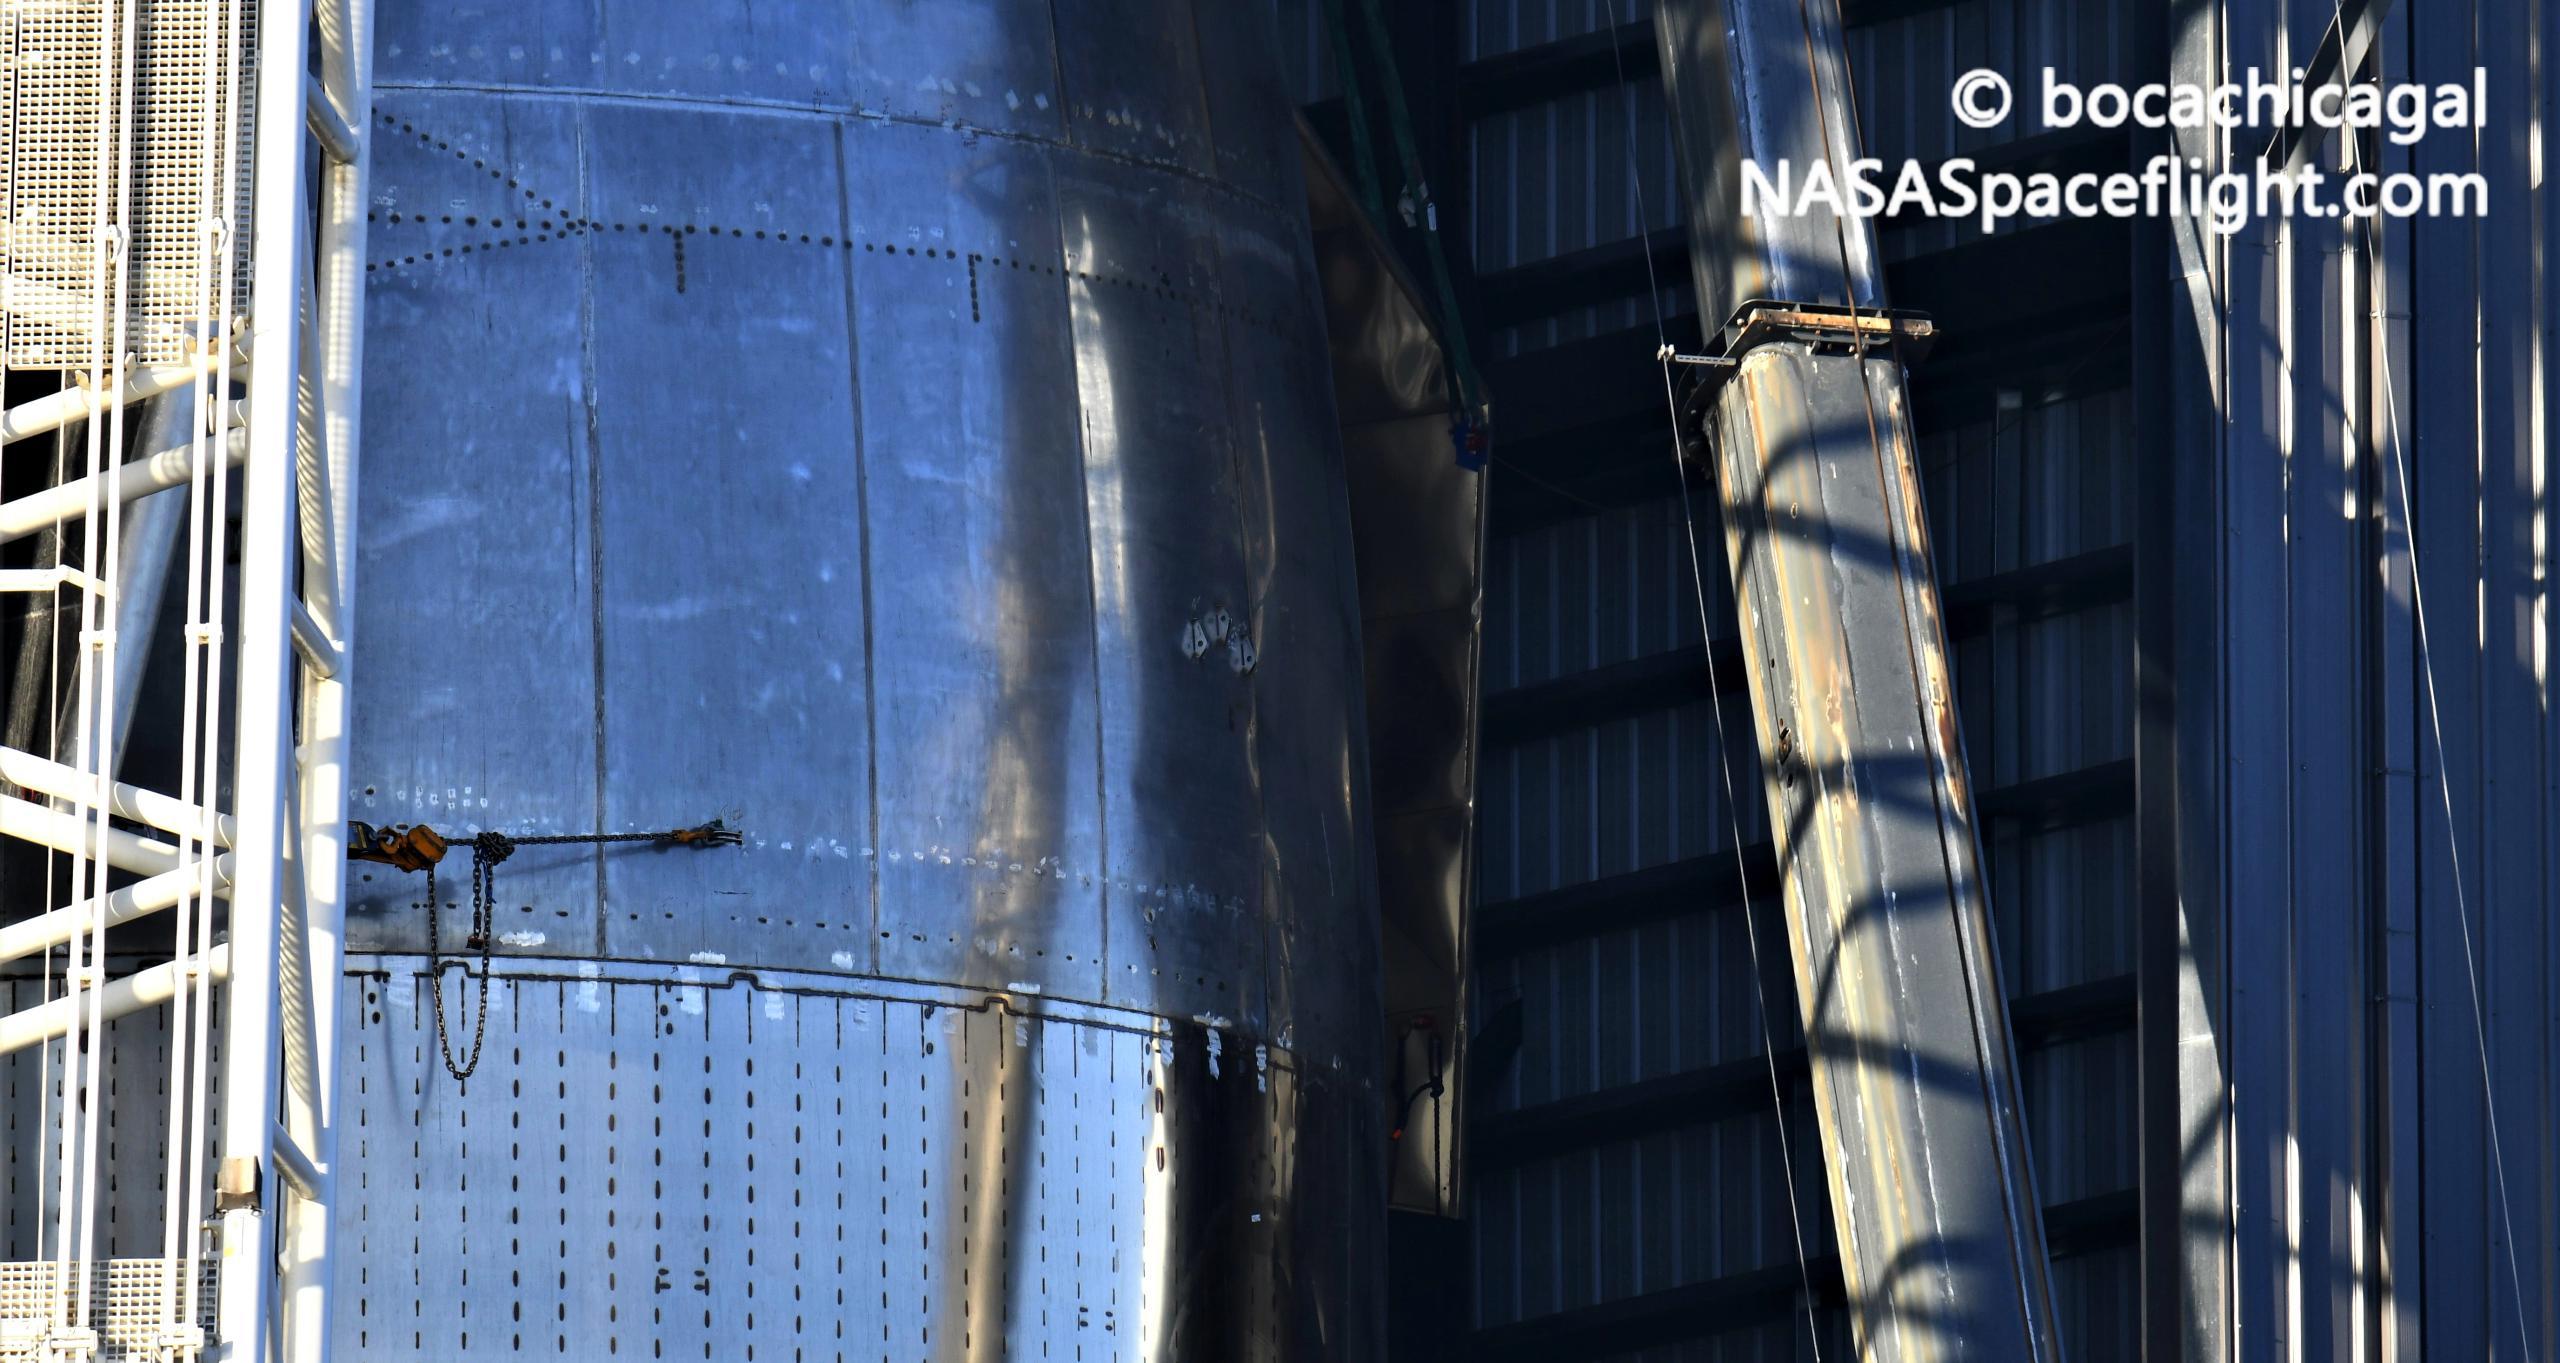 Starship Boca Chica 122020 (NASASpaceflight – bocachicagal) SN9 new flap 1 (c)